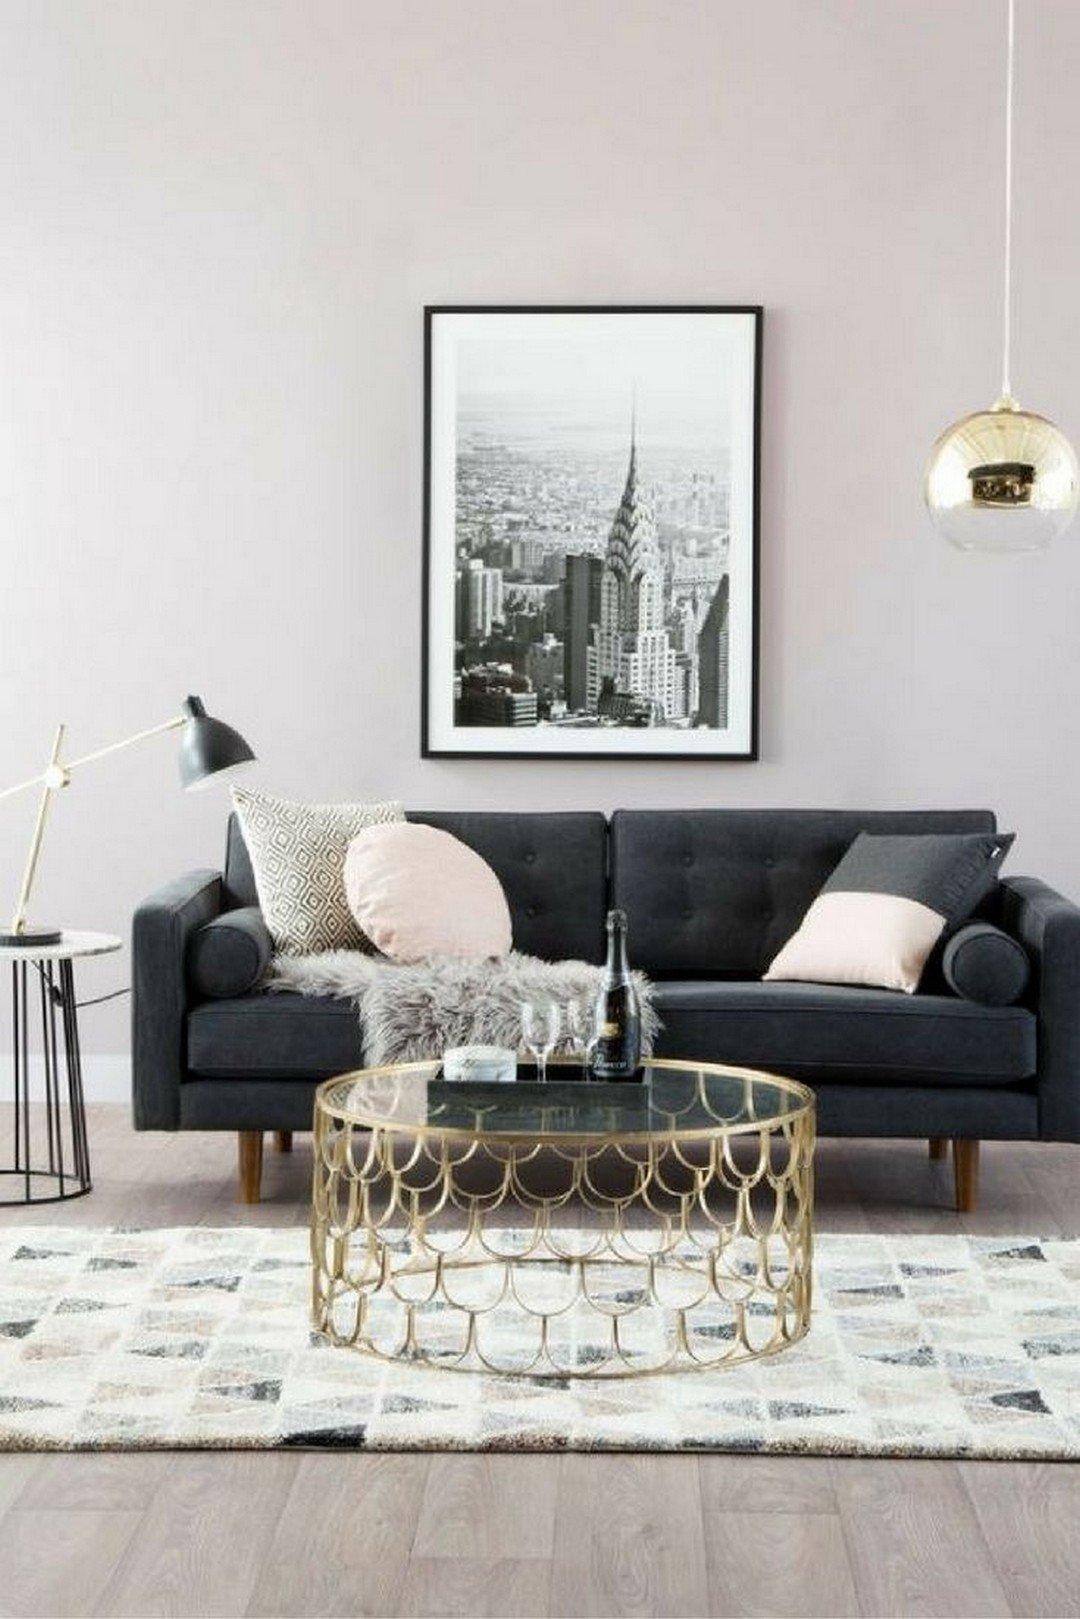 Cozy Small Living Room Ideas Luxury Perfect and Cozy Small Living Room Design 4 De Agz